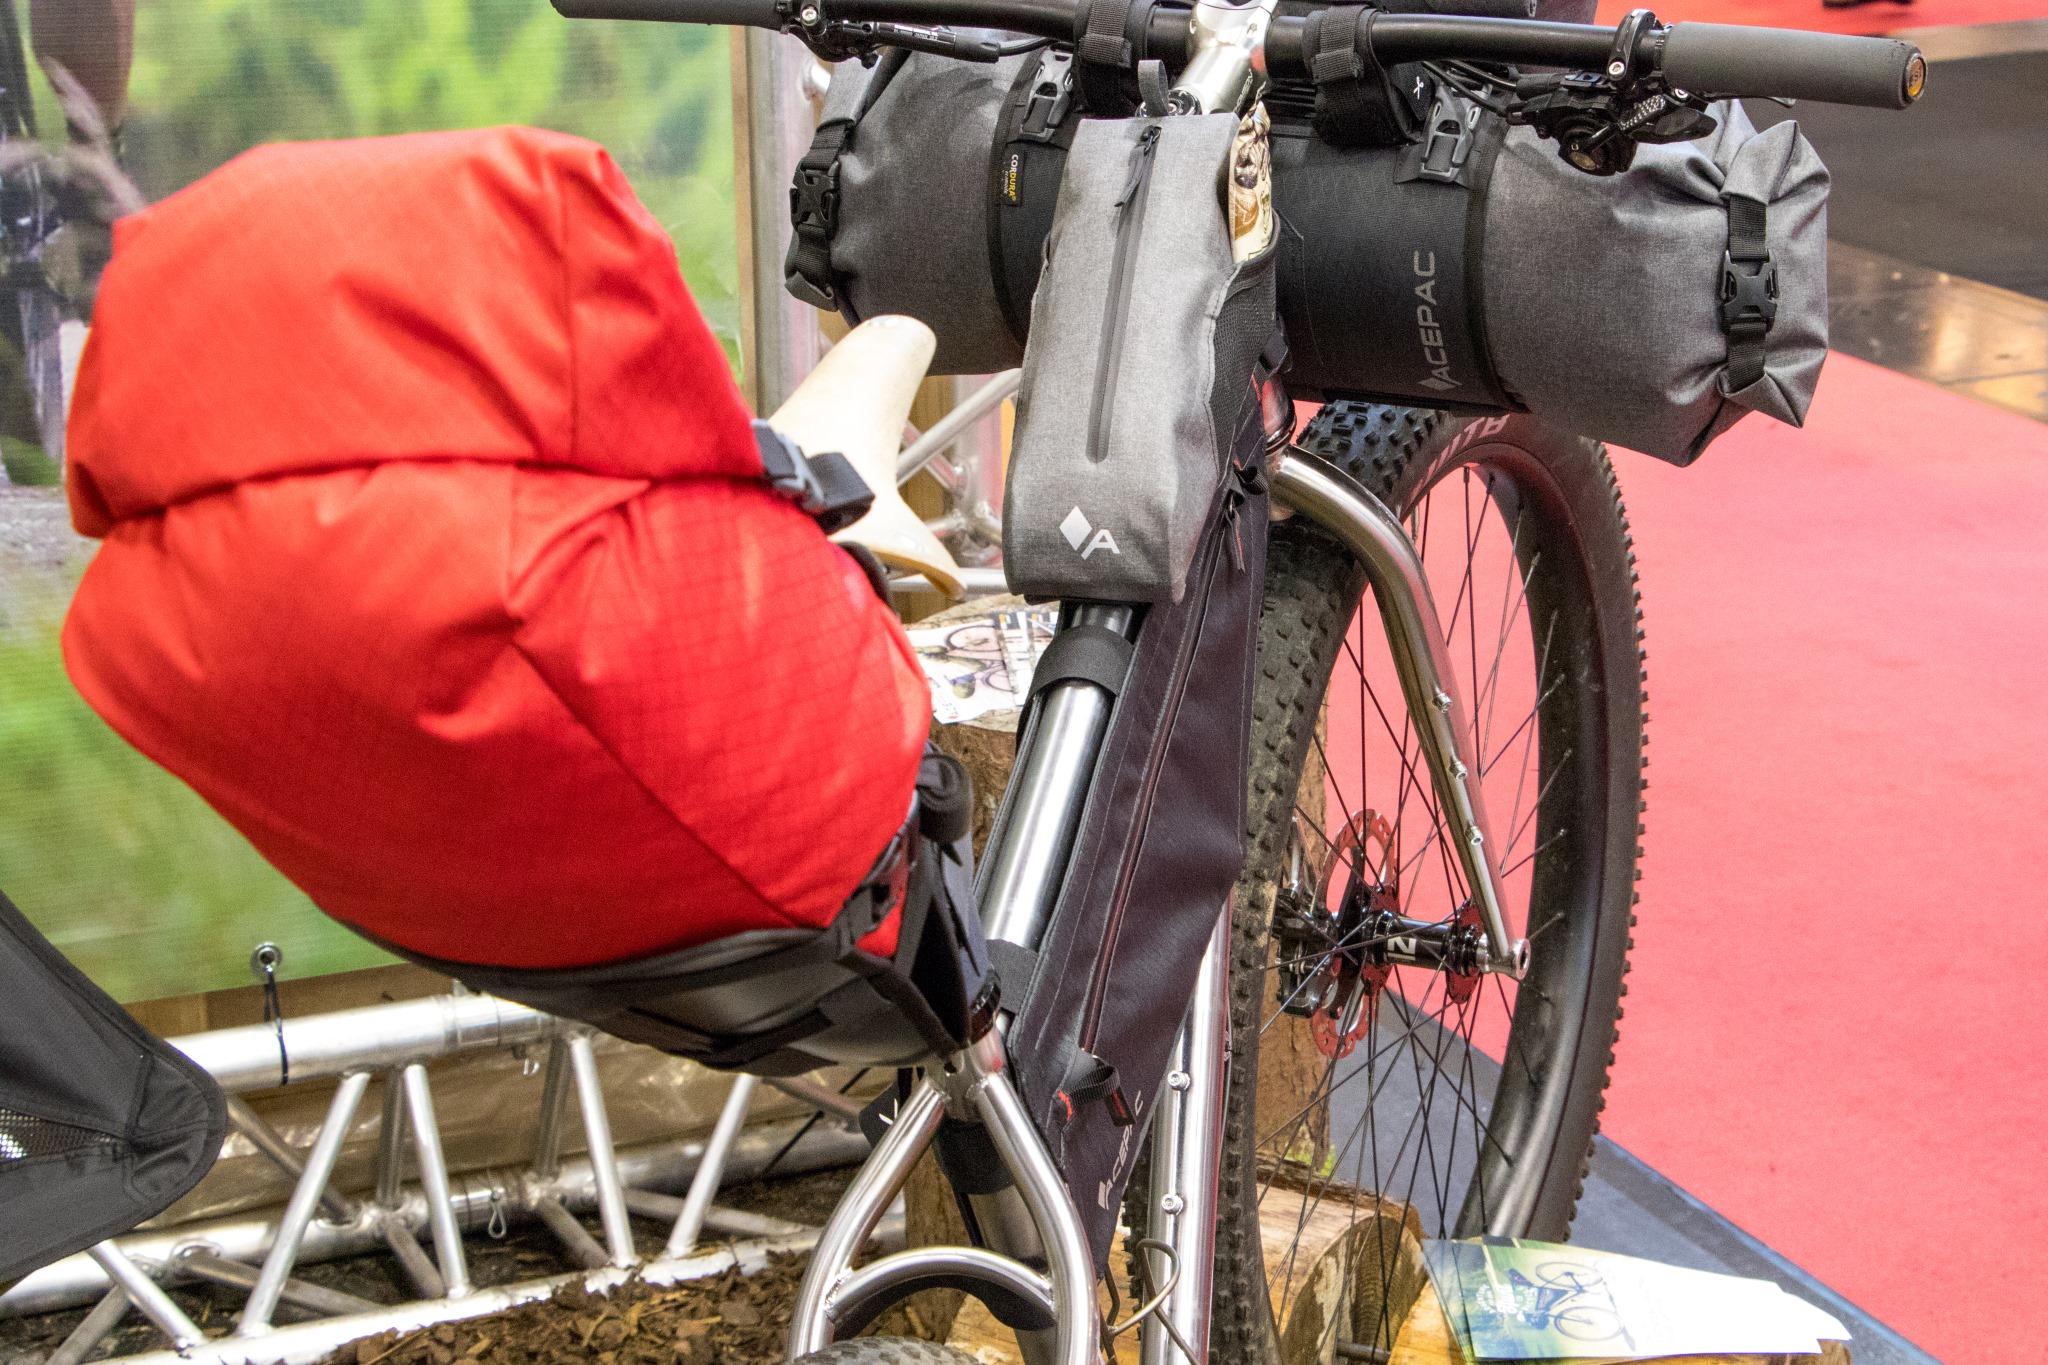 acepack_bikepacking005